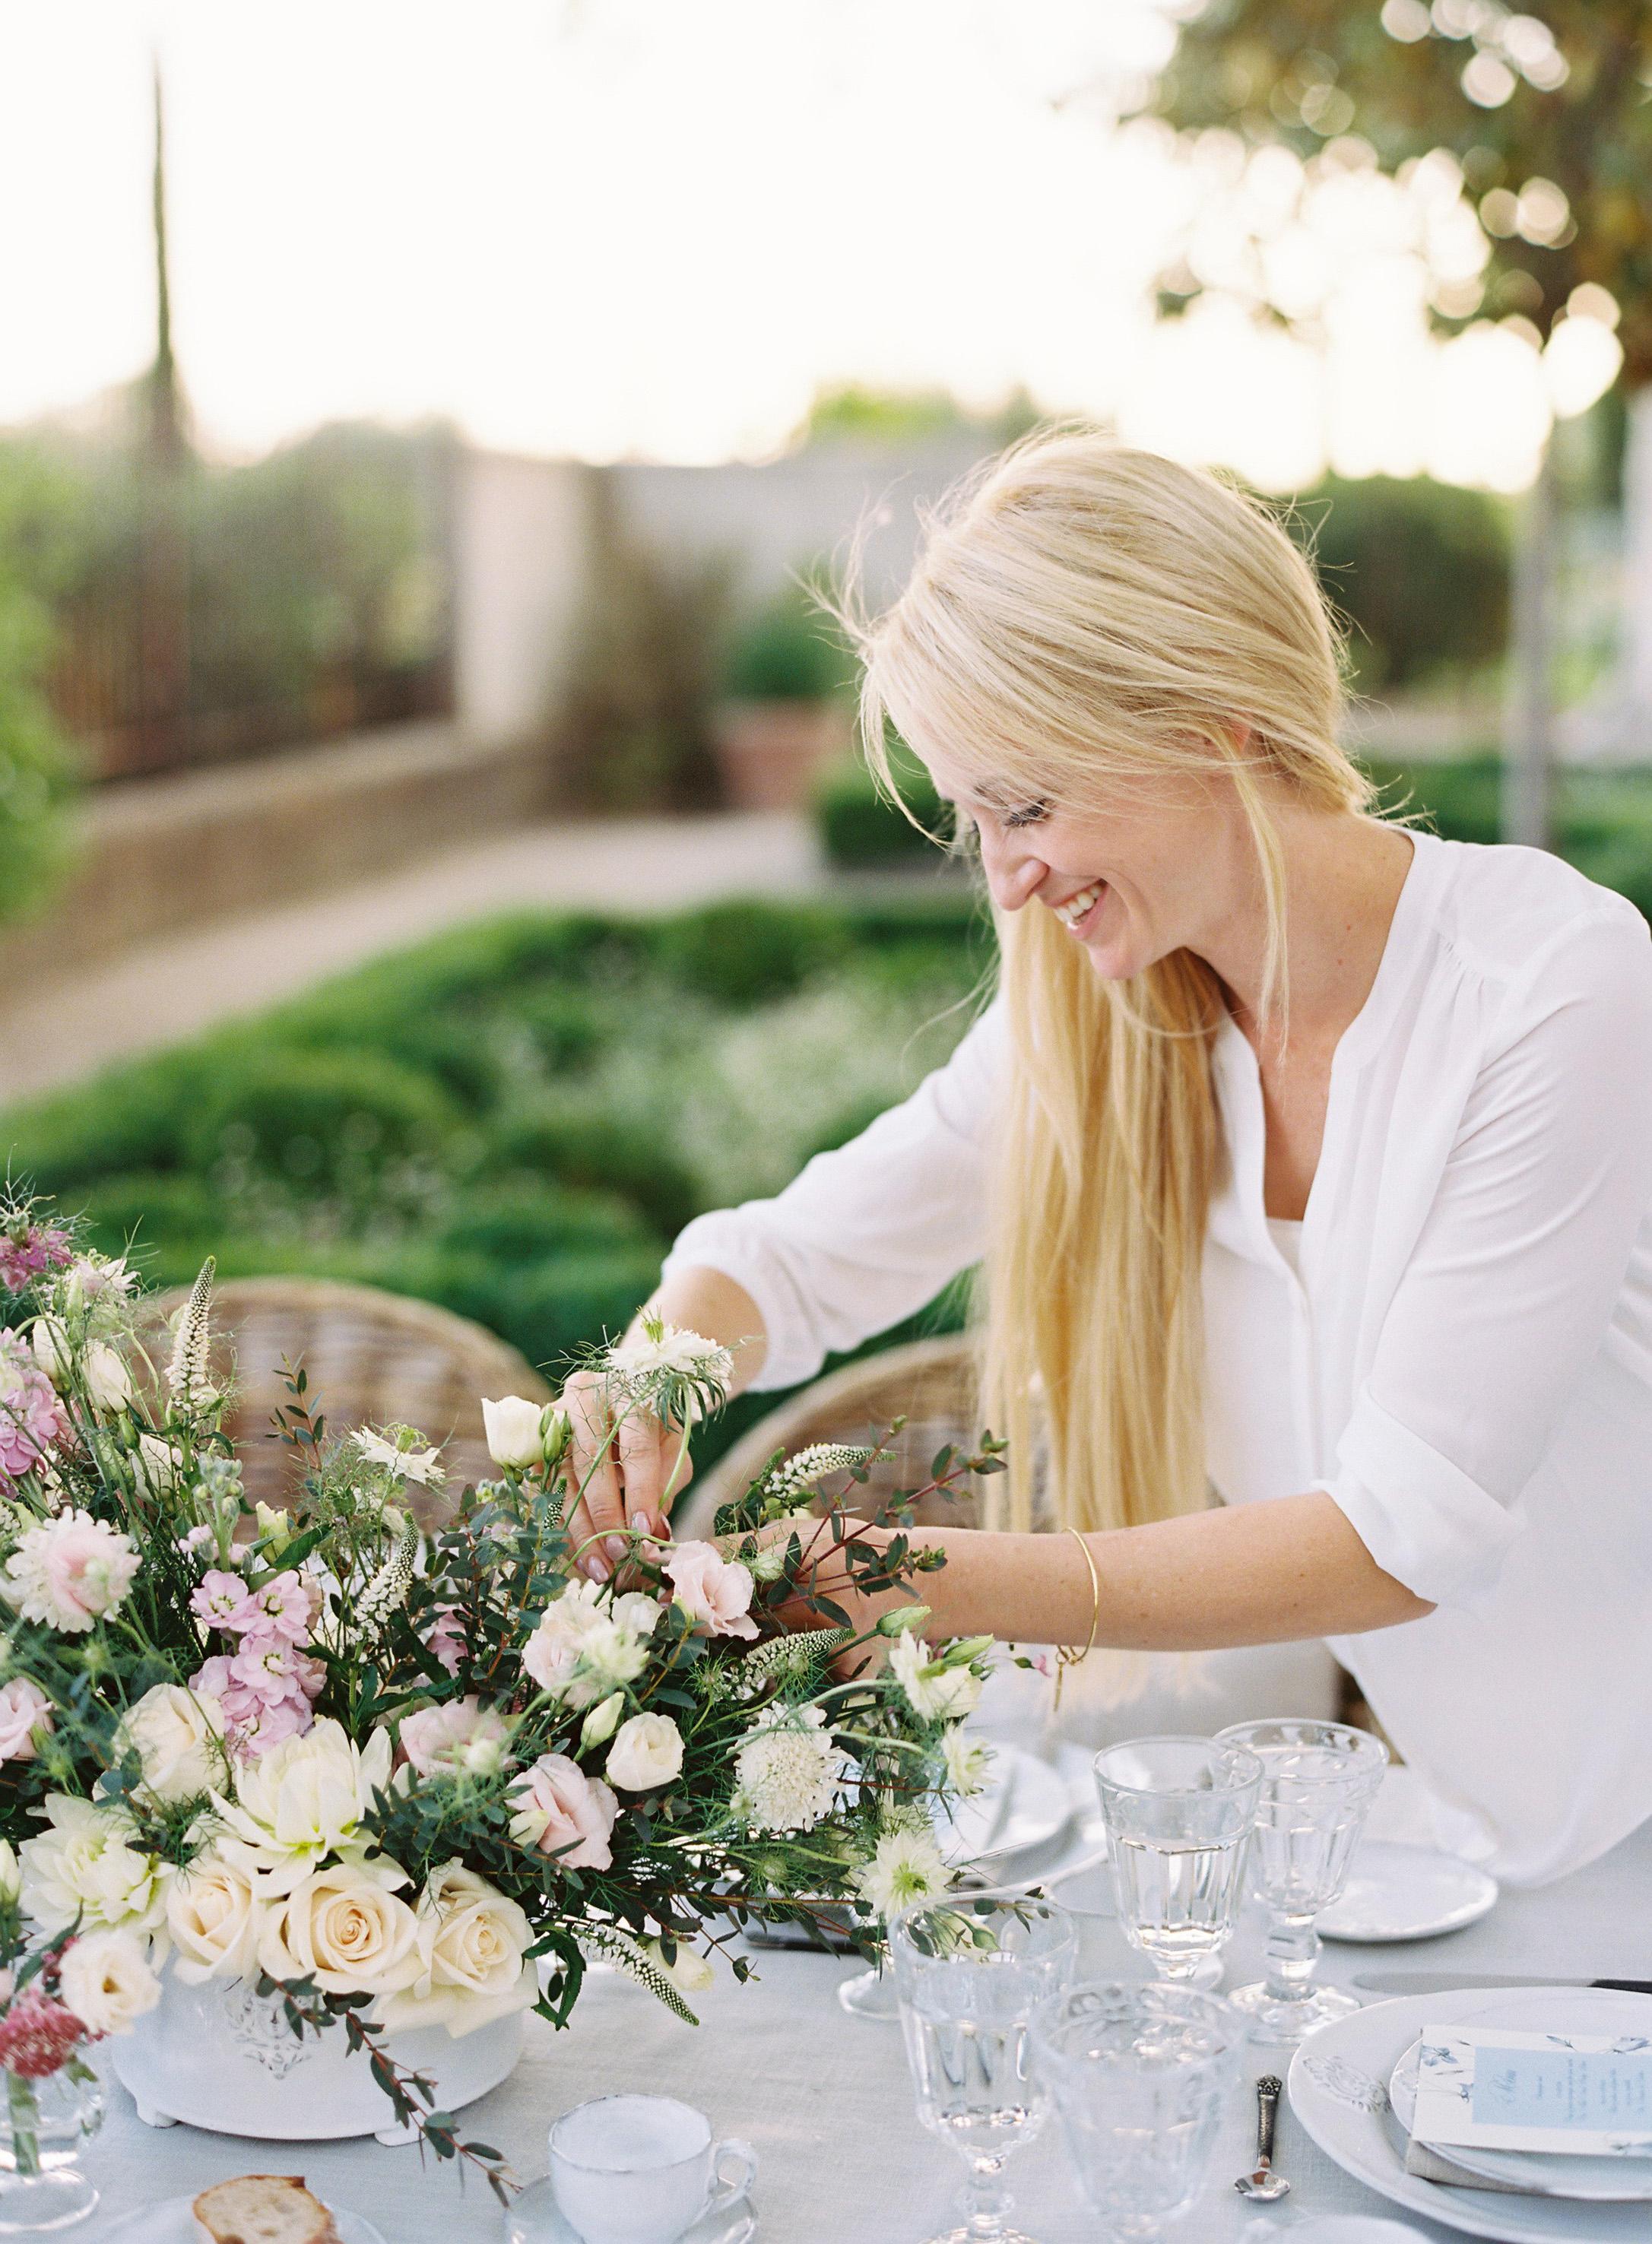 Kimberly Sisti perfecting the flowers